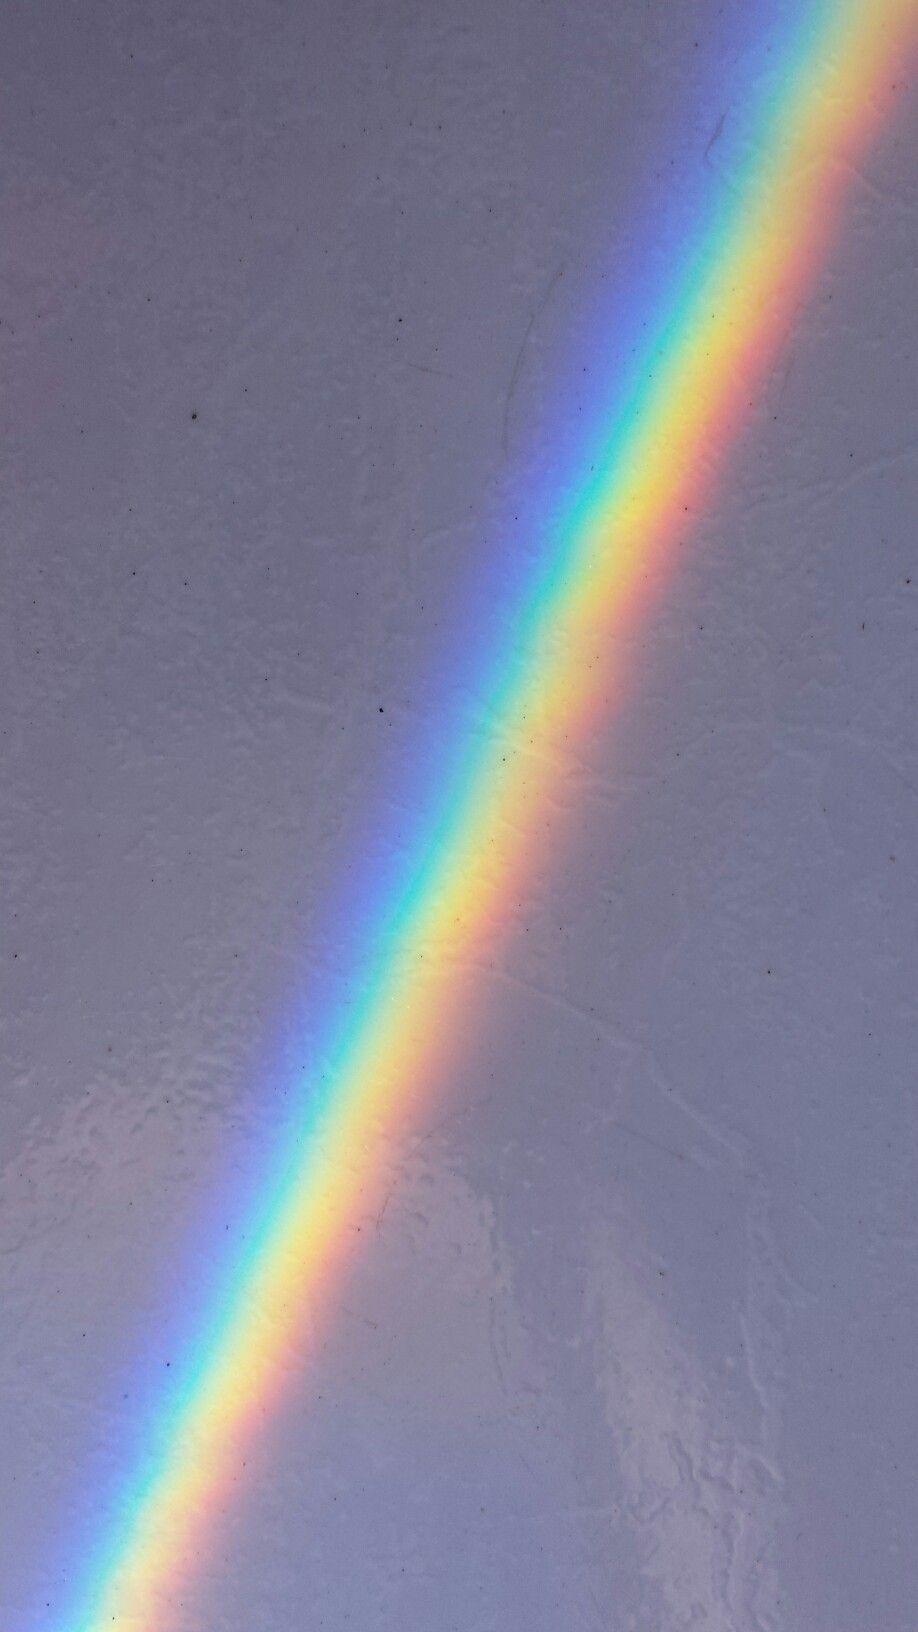 Rainbow Aesthetic Tumblr Wallpapers ...